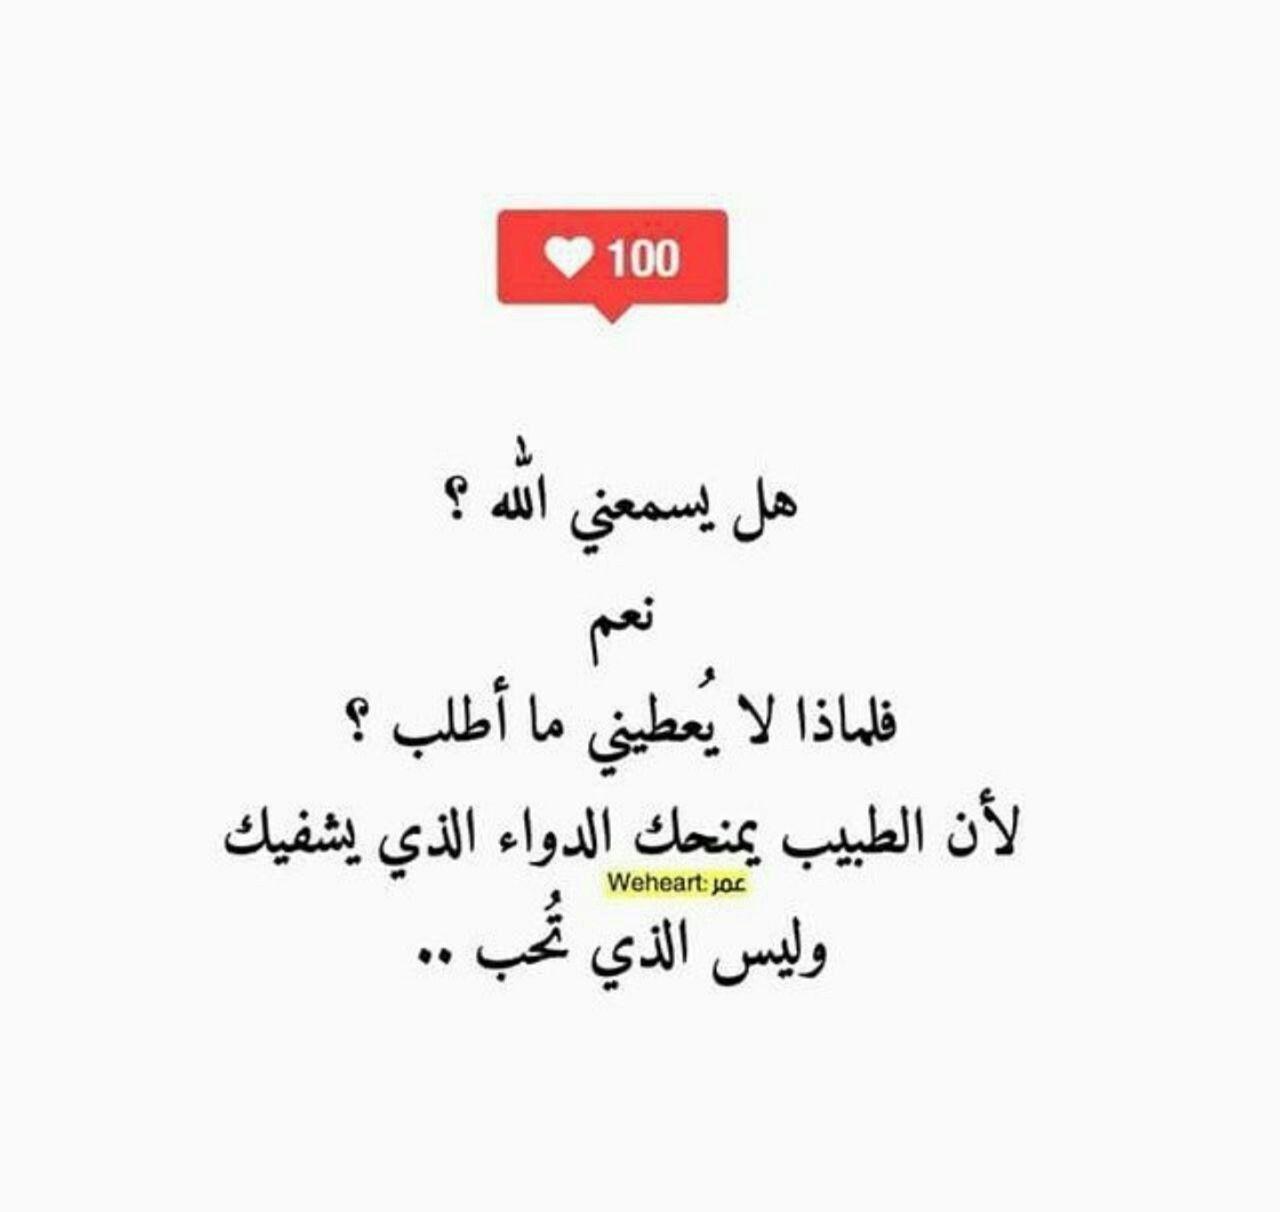 Pin By بنت النجف وافتخر On رمزيات دينية Quotes Arabic Quotes Words